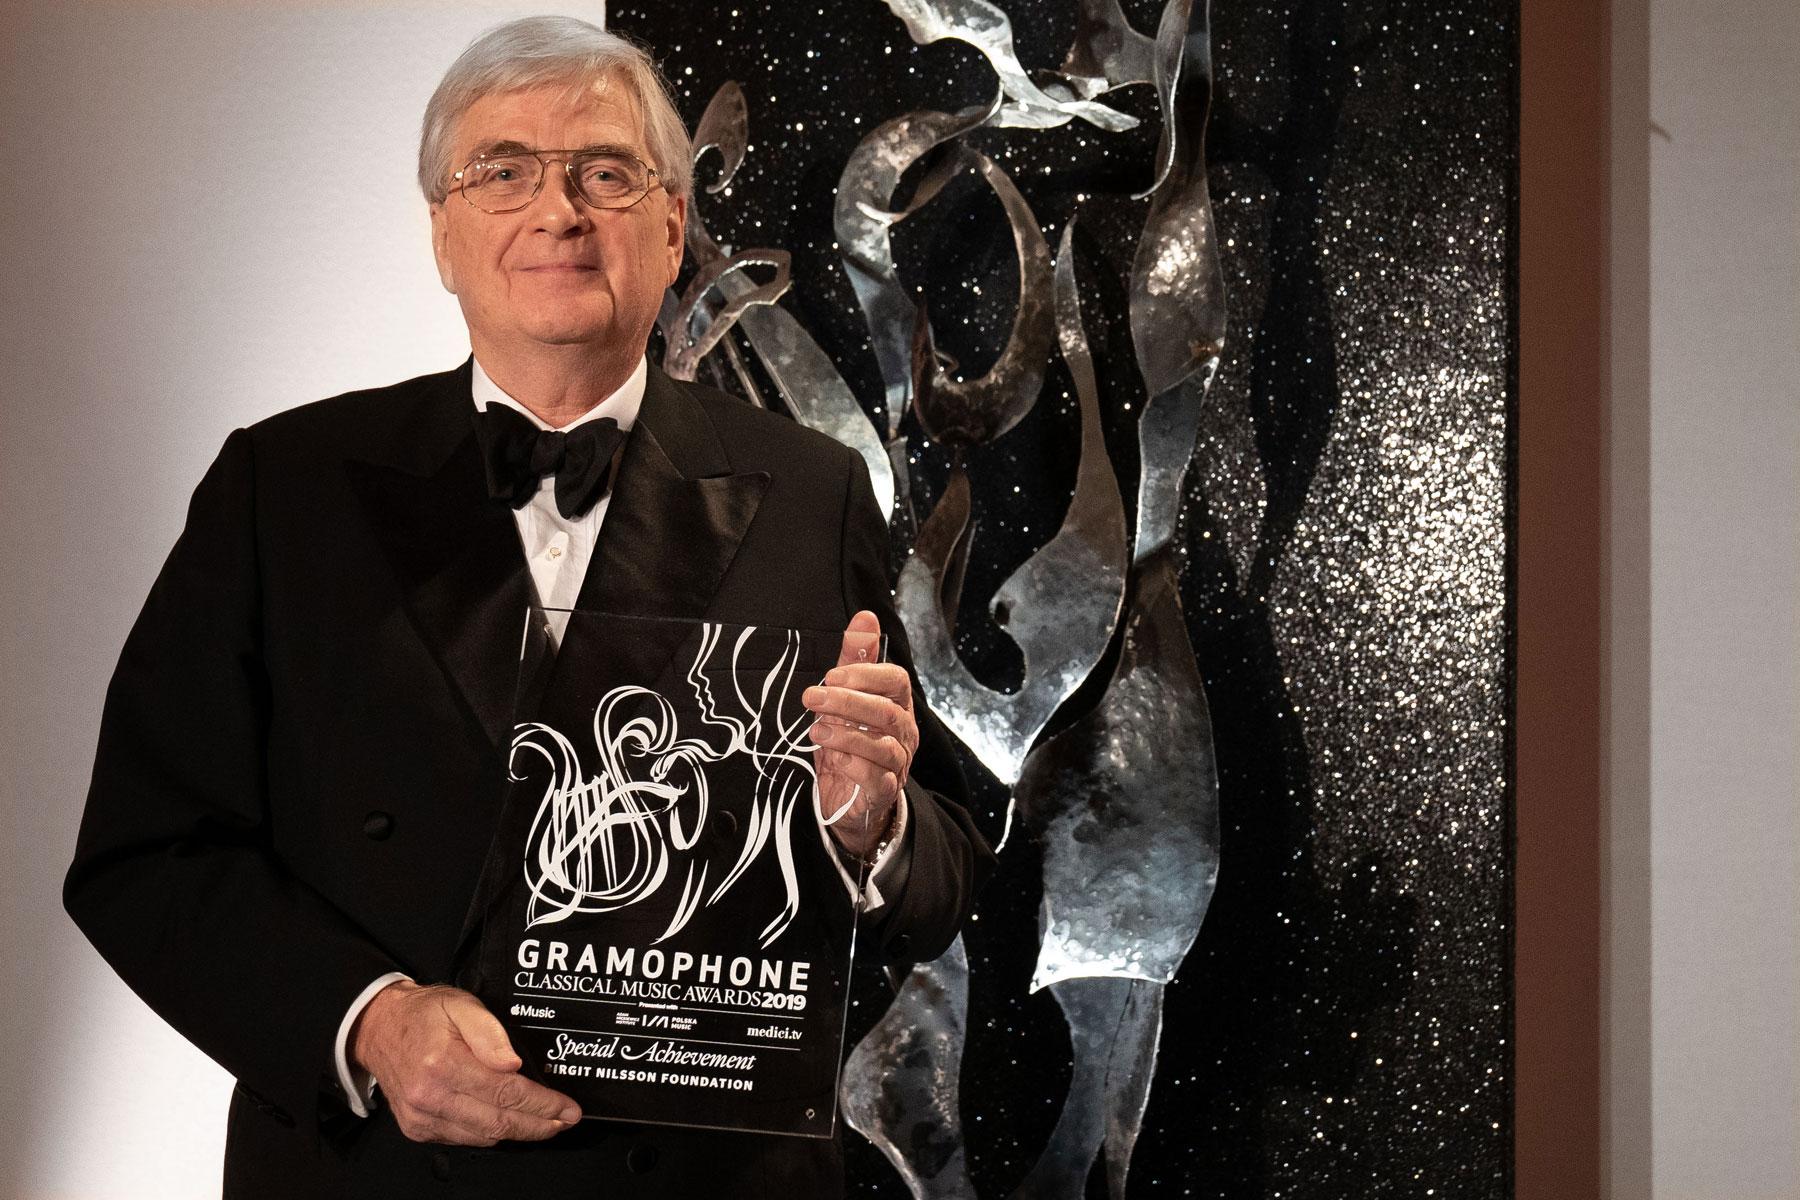 Birgit Nilsson Foundation receives Special Achievement Award at Gramophone Awards for centenary celebration